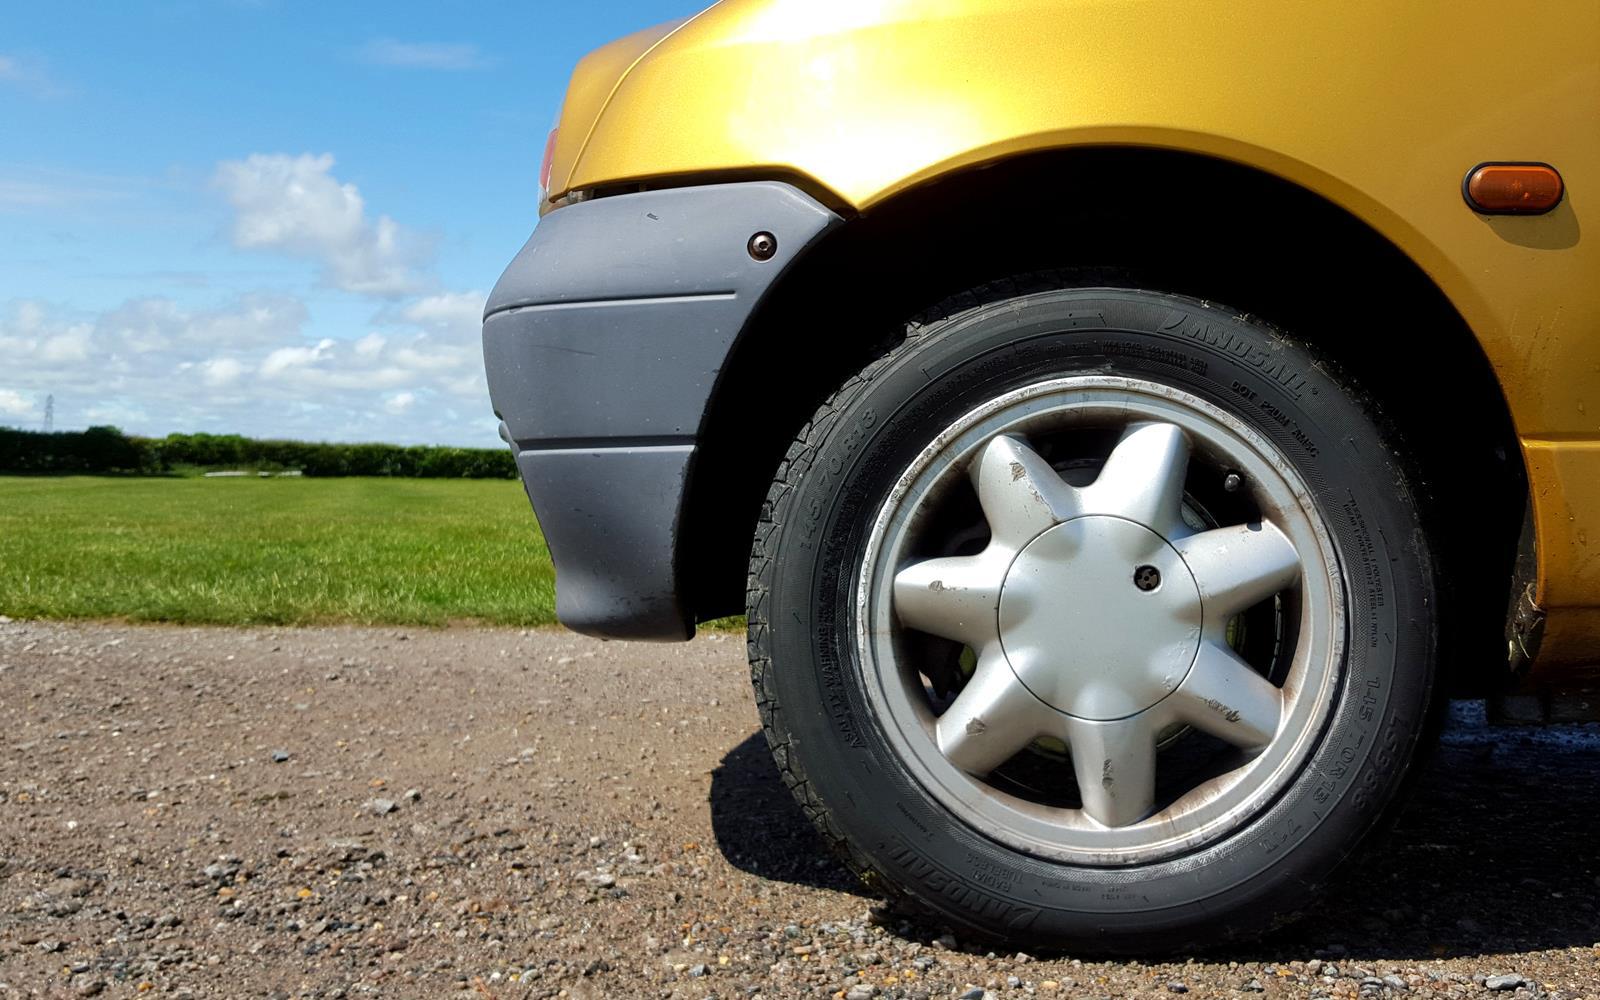 Renault Twingo 1998 Landsail Tyres